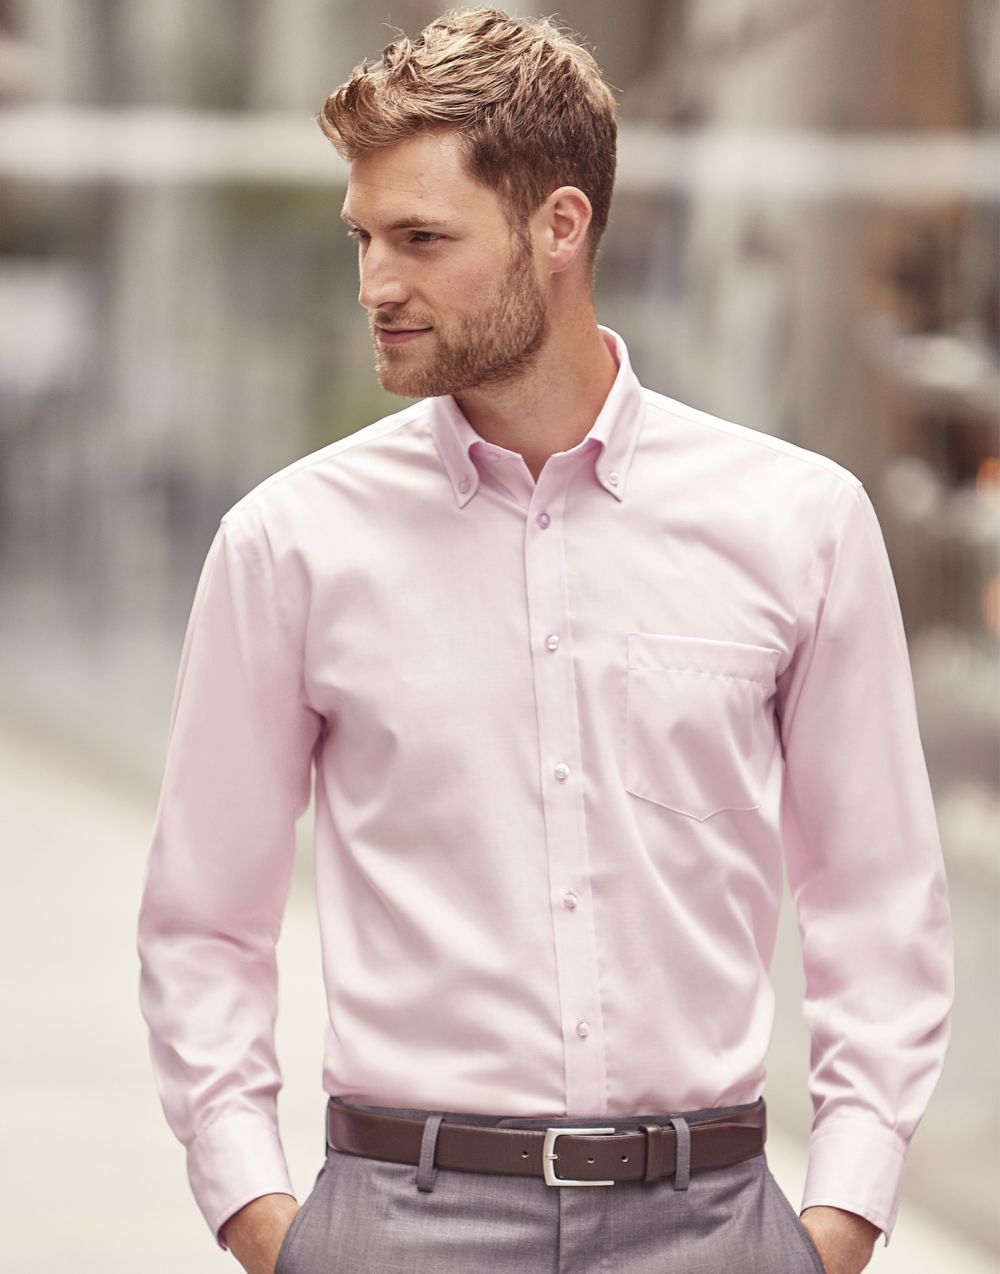 Camisas manga larga russell manga larga hombre con publicidad vista 3